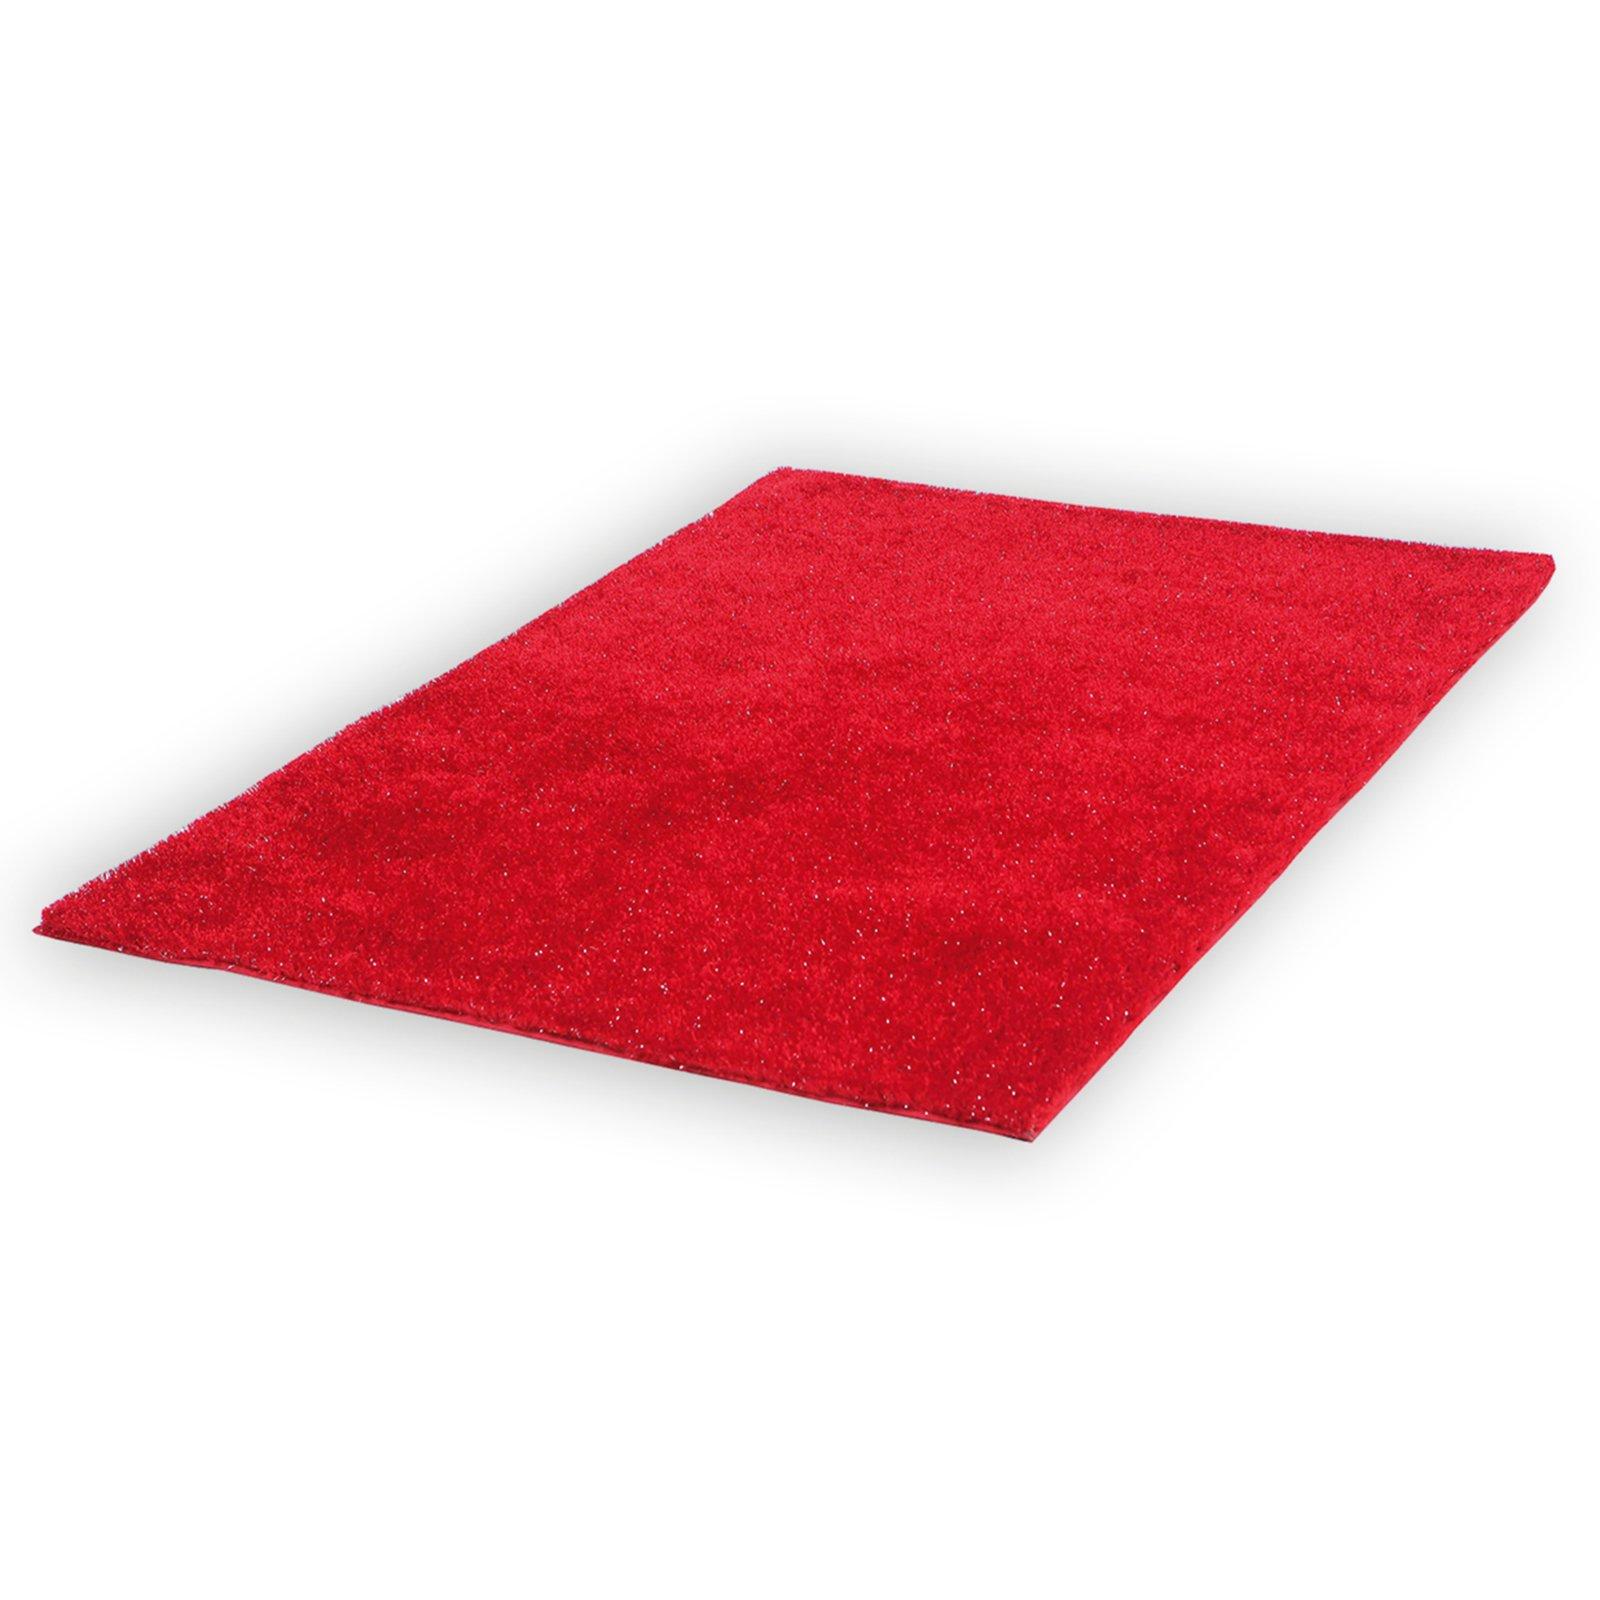 teppich shaggy stella rot glanzf den 160x230 cm hochflor shaggyteppiche teppiche. Black Bedroom Furniture Sets. Home Design Ideas